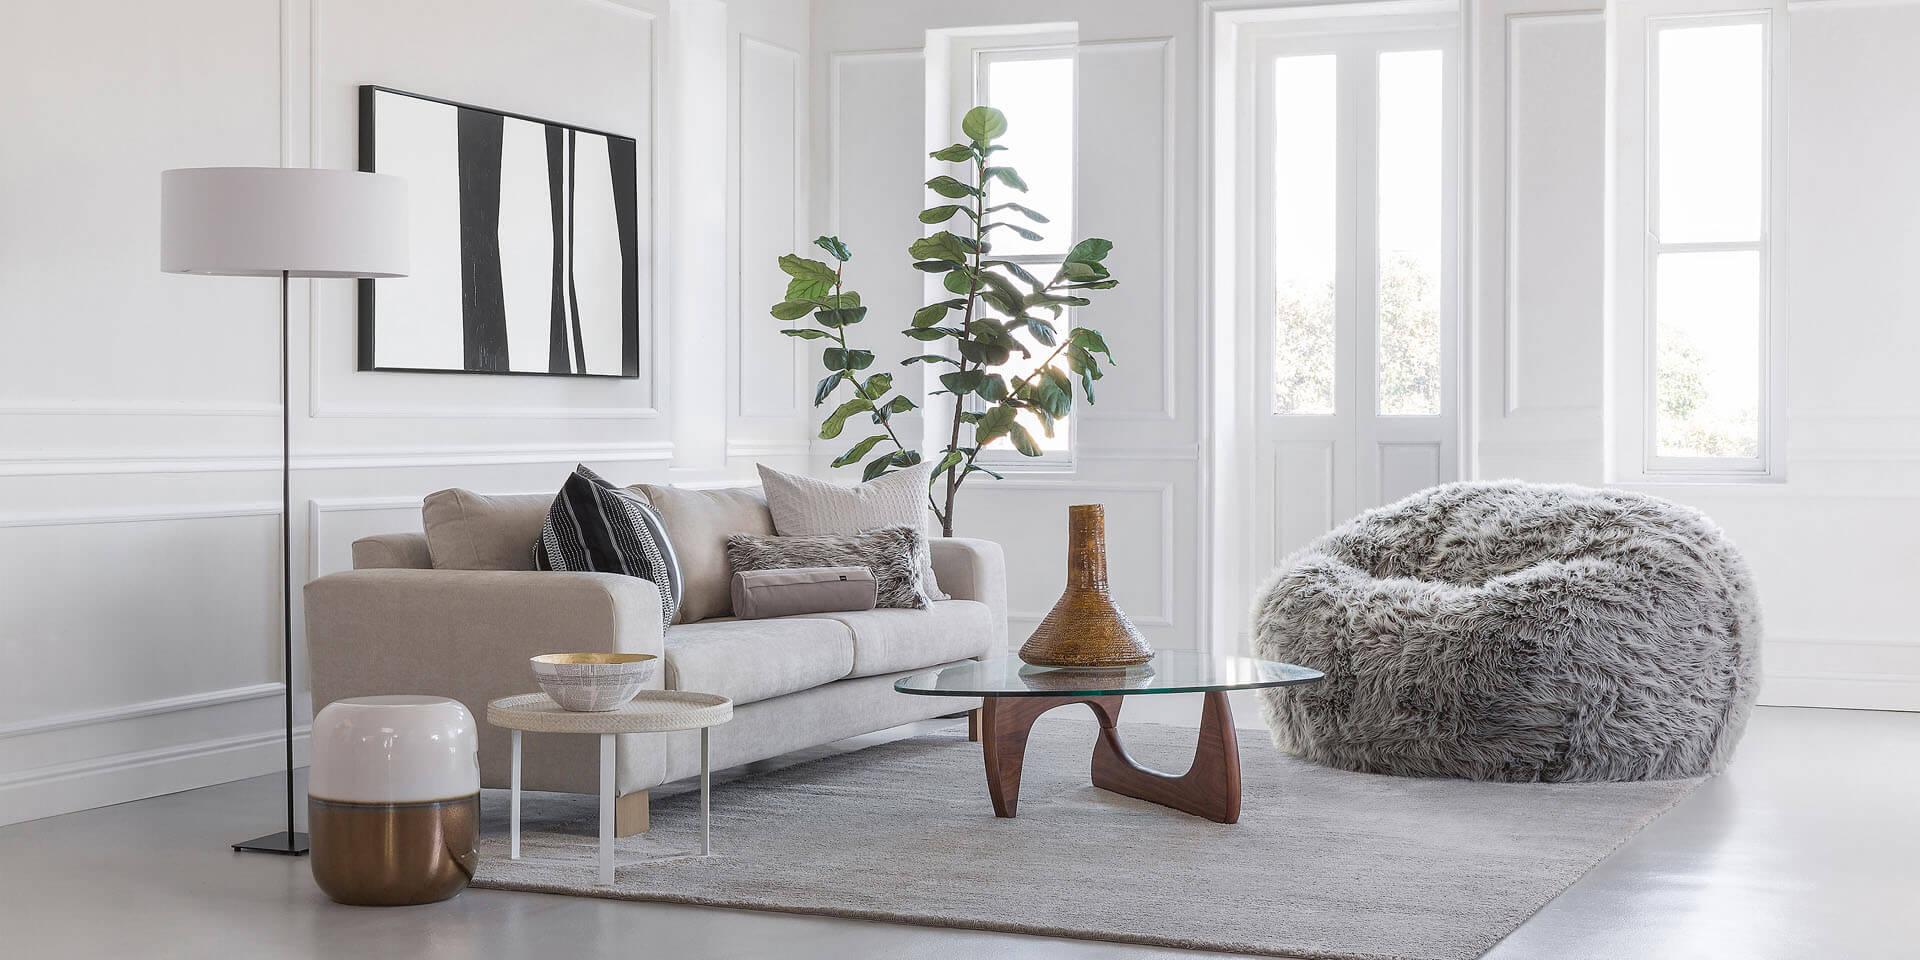 riesen sitzsack fell jetzt online bestellen satamo. Black Bedroom Furniture Sets. Home Design Ideas